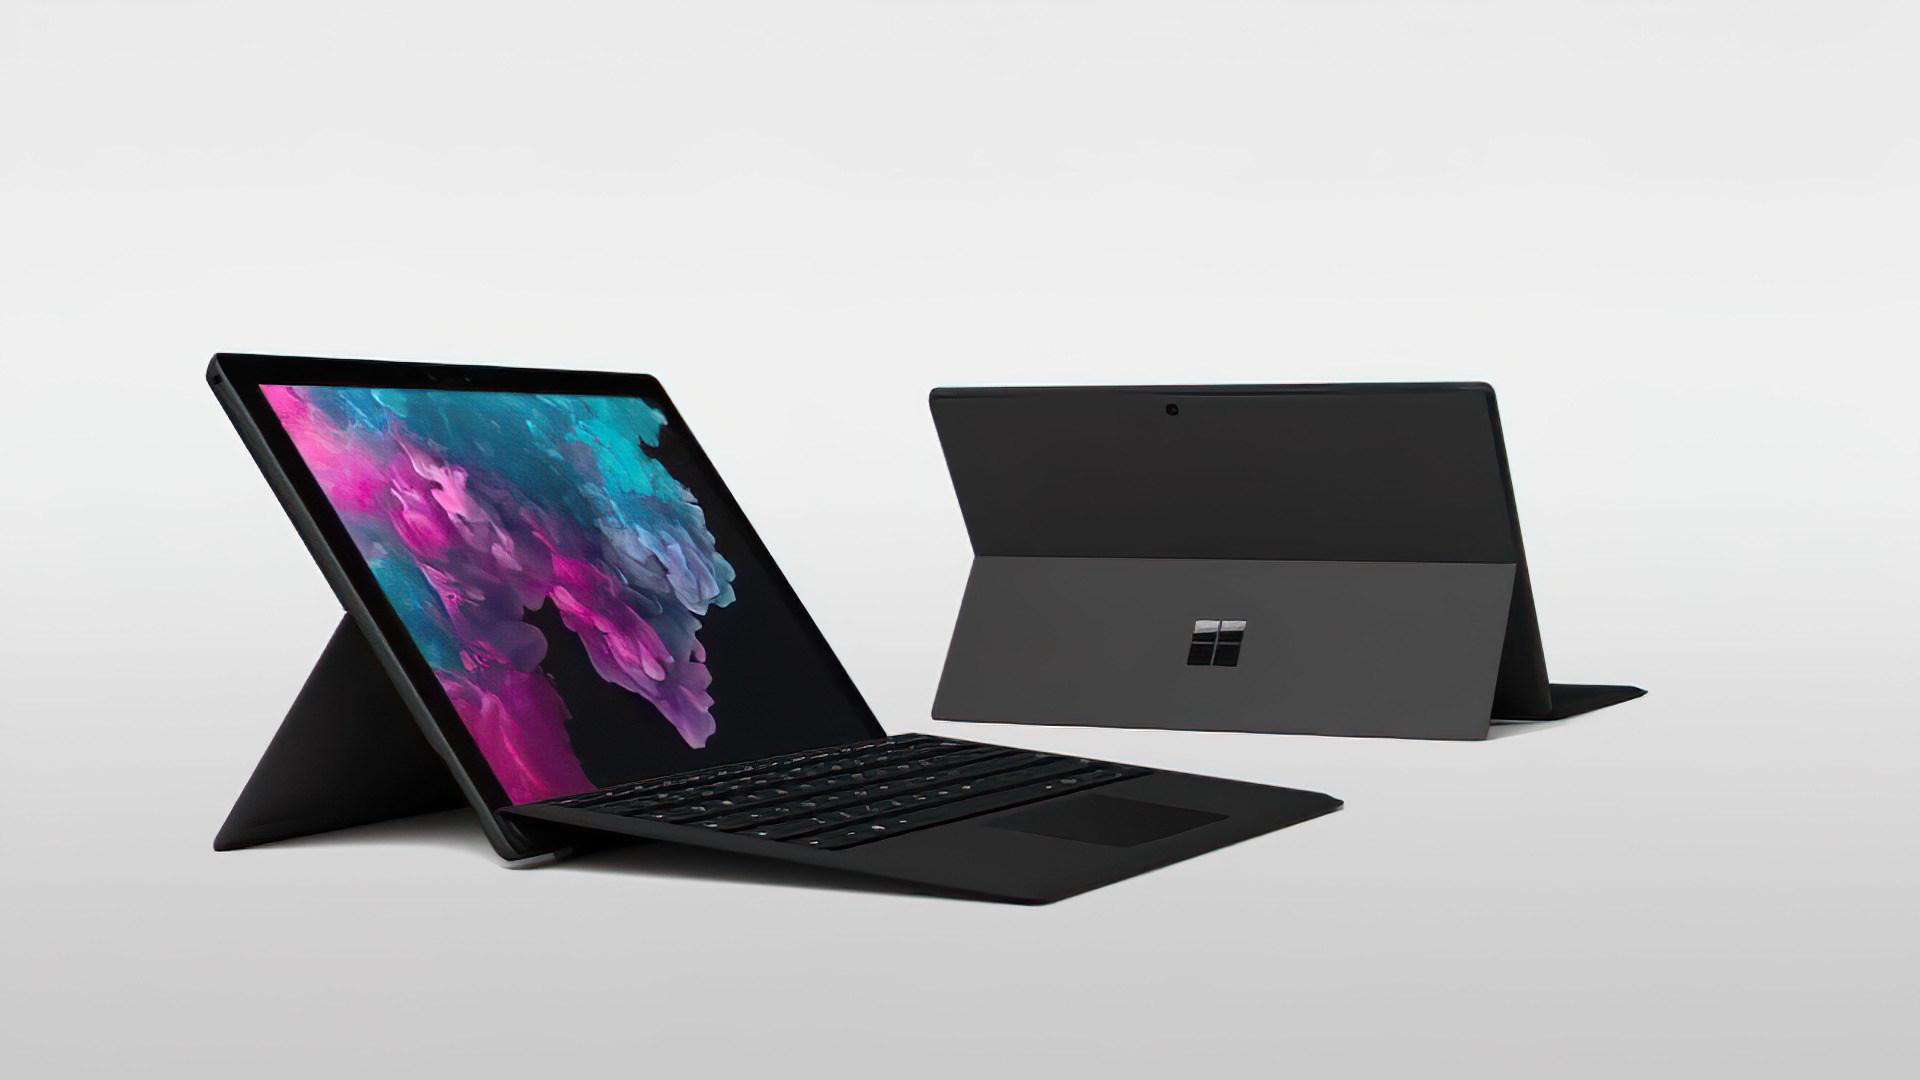 Surface Pro, Surface Pro 6, Microsoft Surface Pro 6